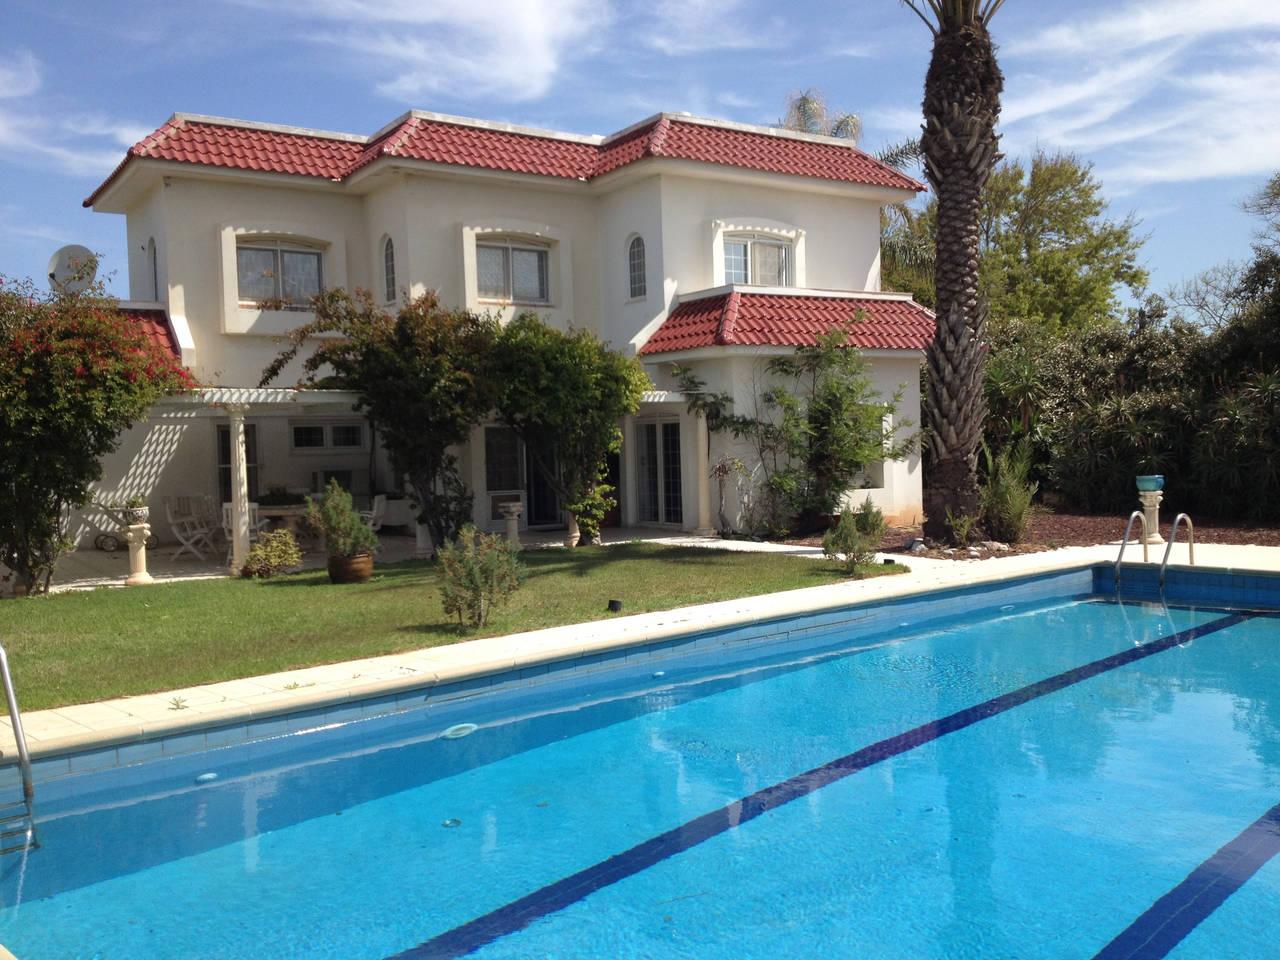 Apartment Dream house by the sea in Caesarea photo 25979665